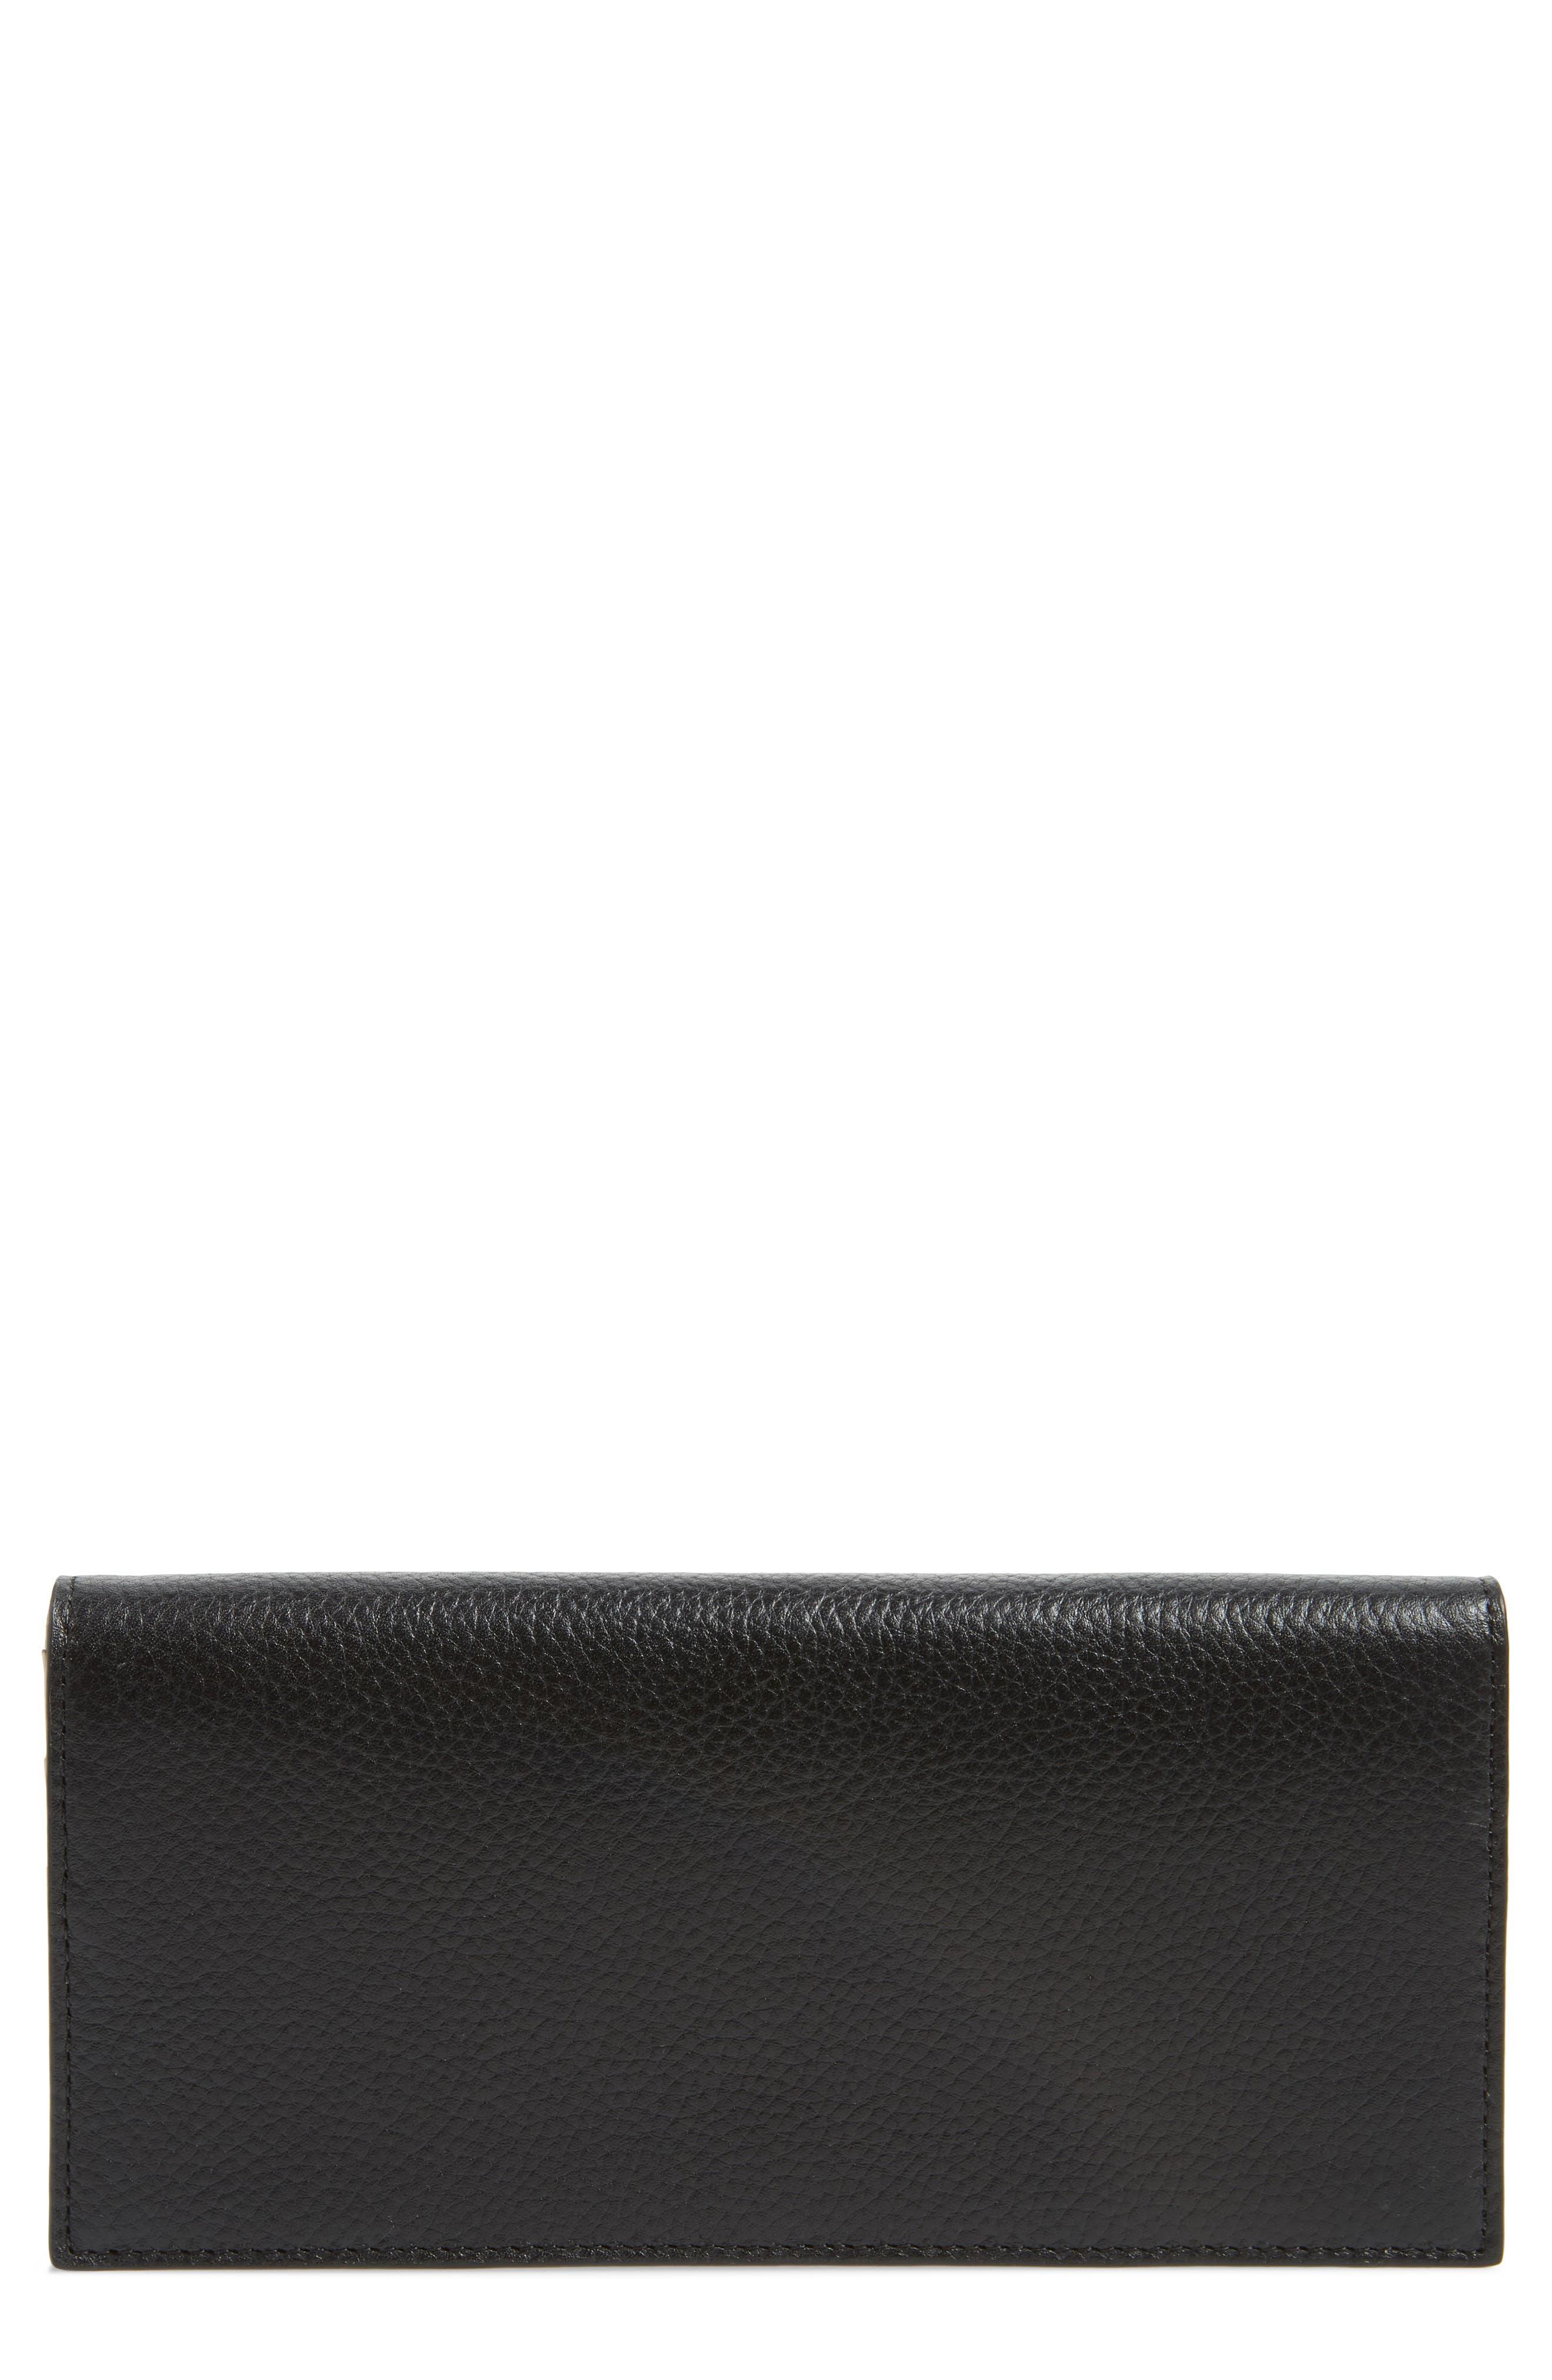 Hunter Leather Continental Wallet,                             Main thumbnail 1, color,                             BLACK